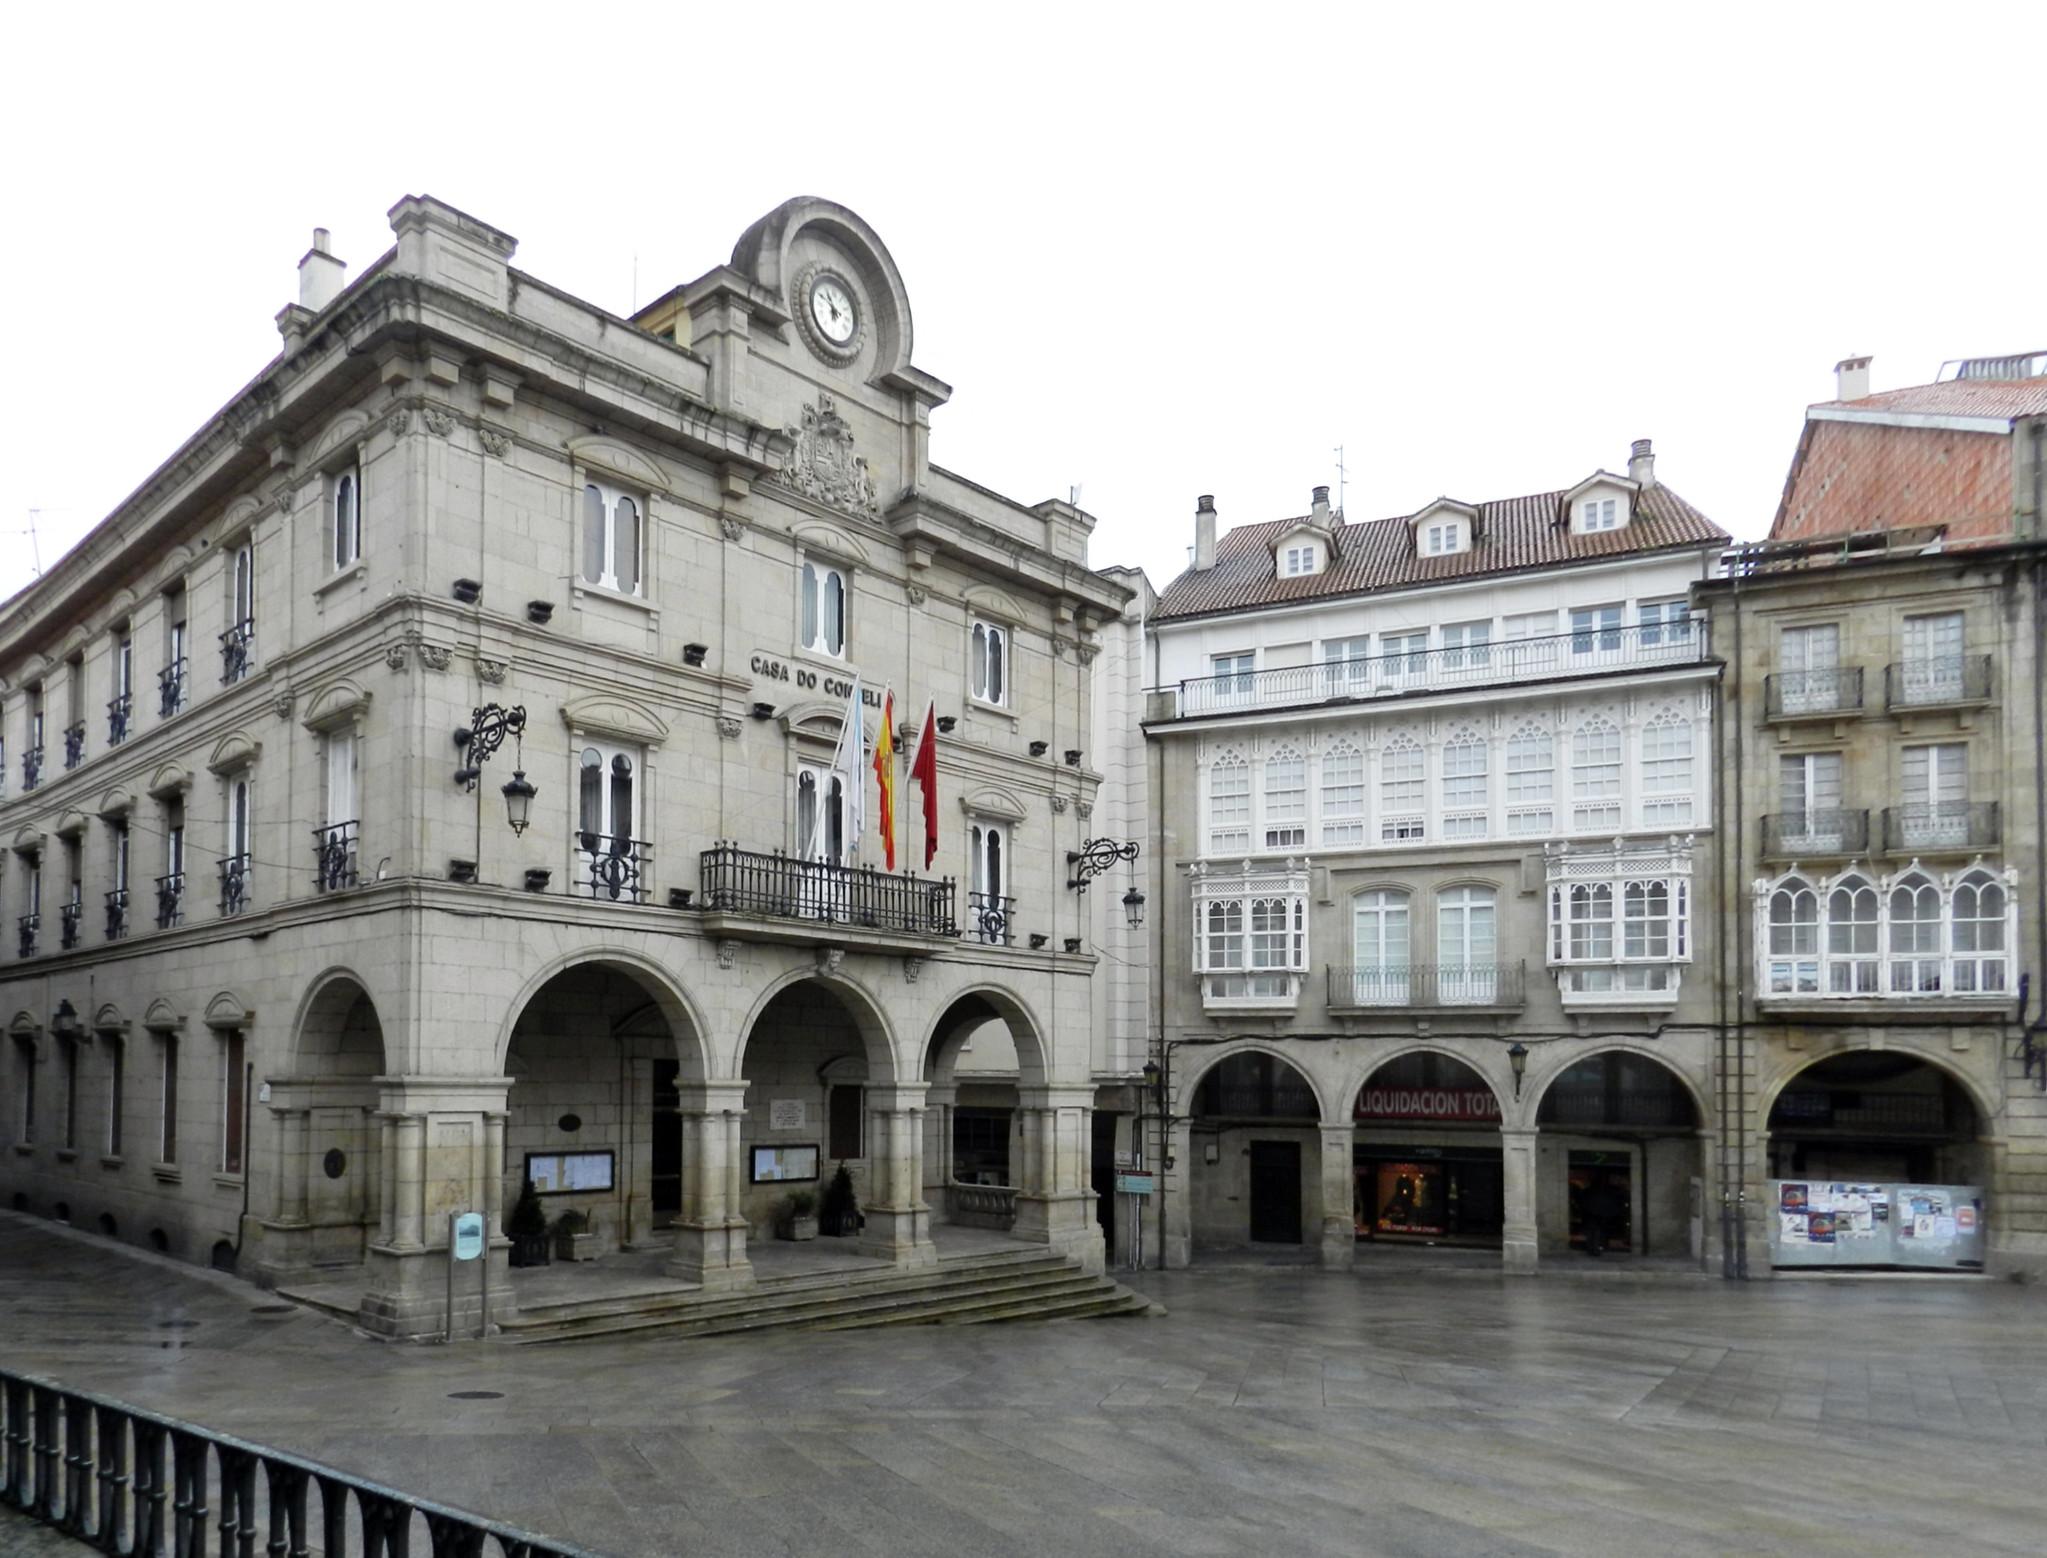 edificio del Ayuntamiento o Casa do Concello, Plaza Mayor ciudad Orense Ourense España